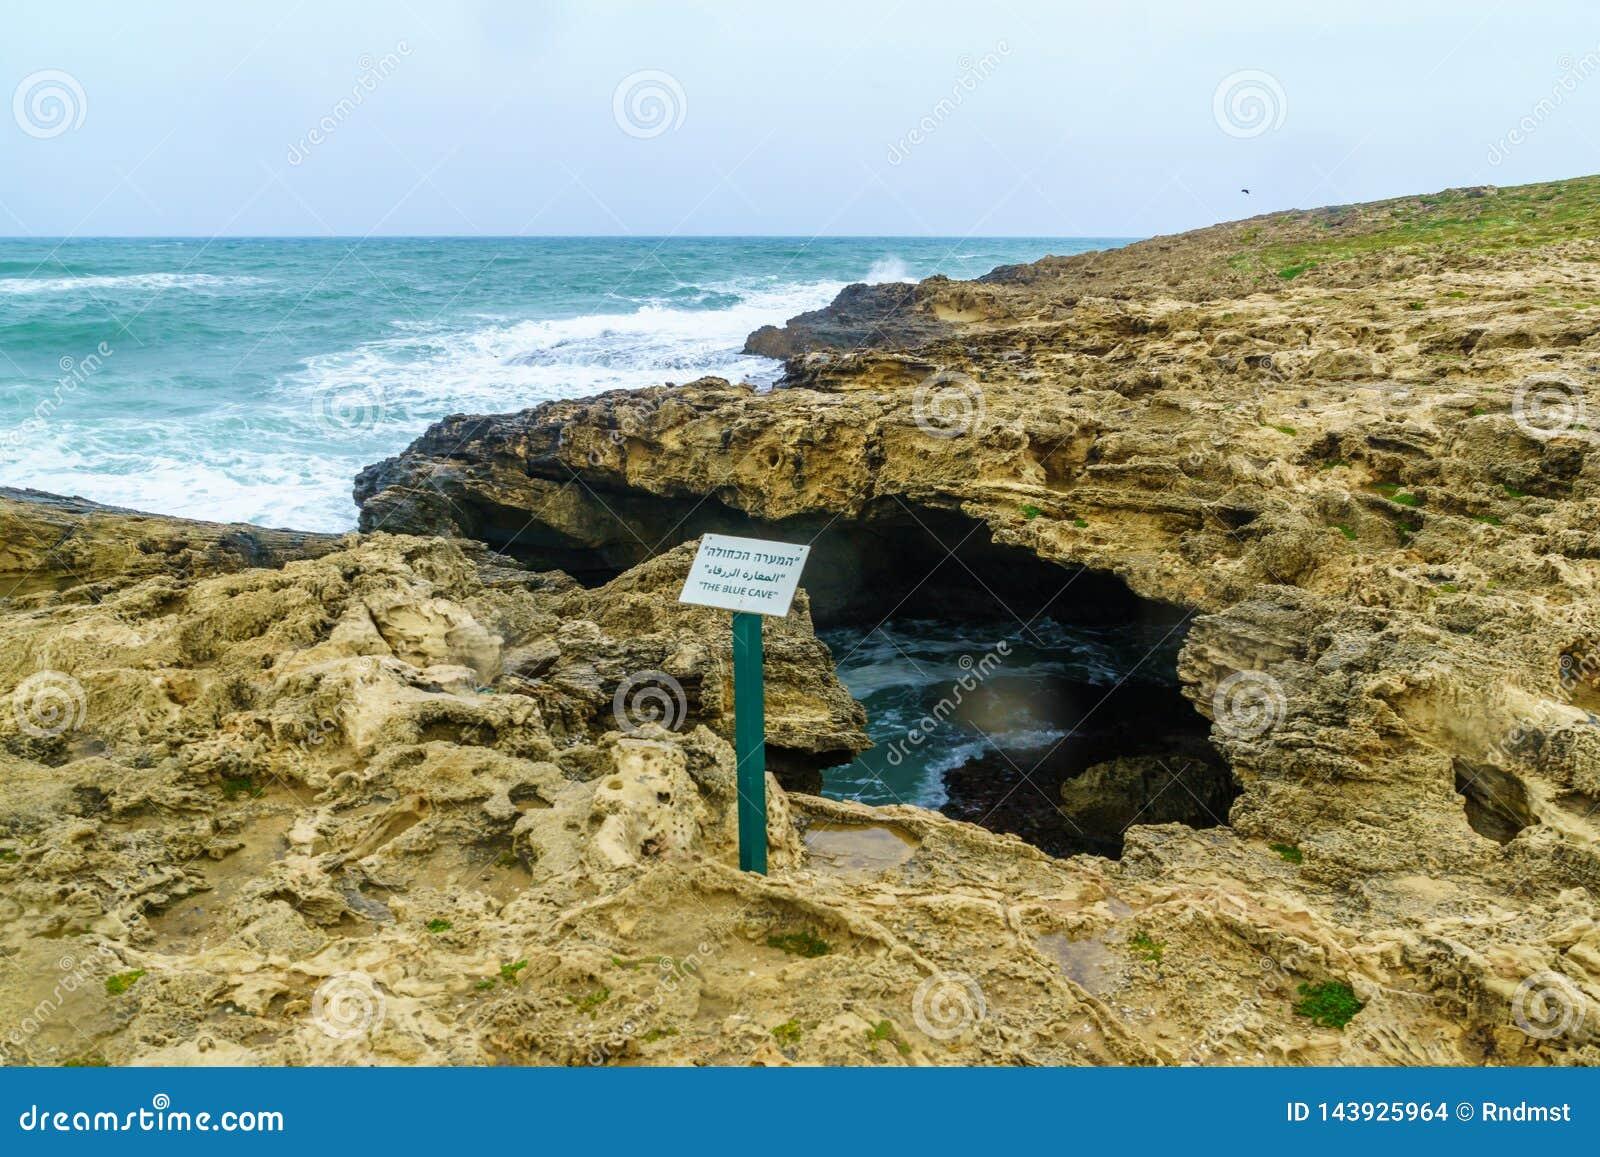 Il blu frana Dor HaBonim Beach Nature Reserve